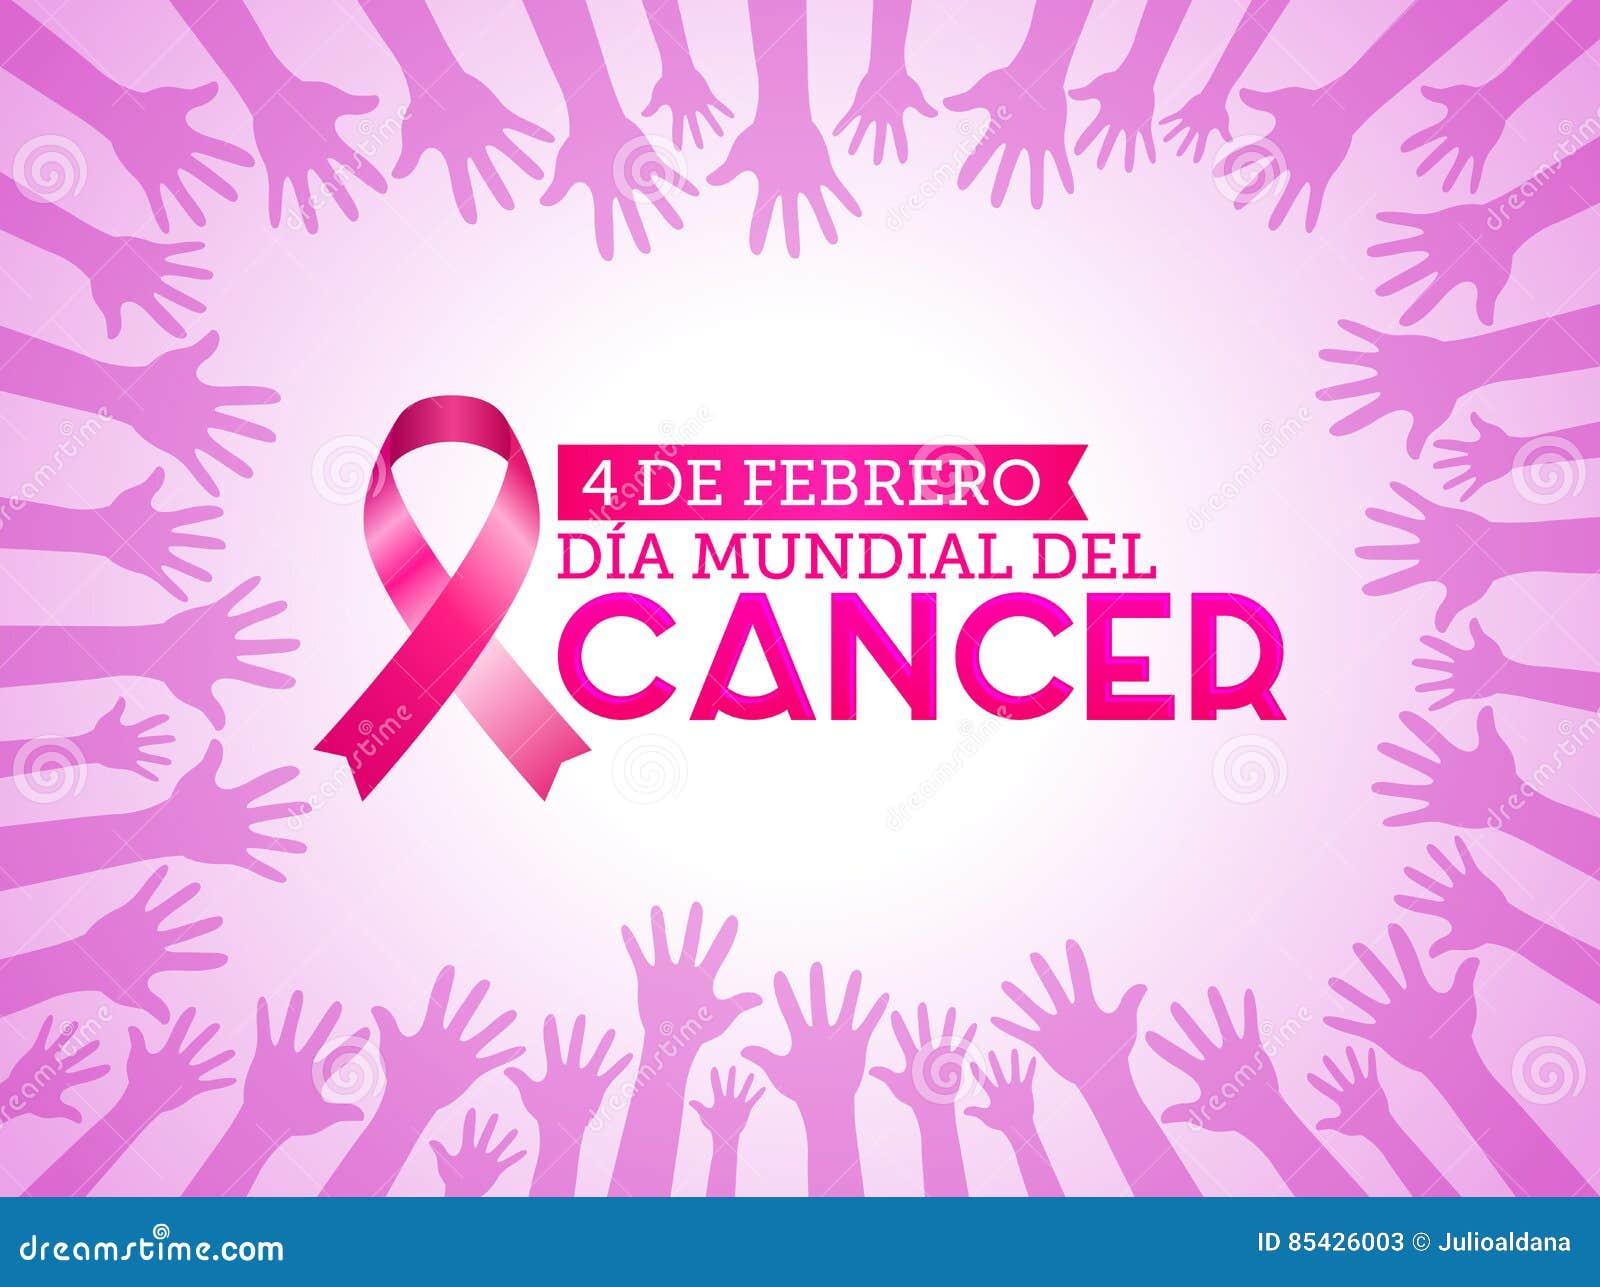 Dia mundial del Cancer - ισπανικό κείμενο στις 4 Φεβρουαρίου ημέρας παγκόσμιου καρκίνου Η ρόδινη κορδέλλα με τα χρώματα δίνει επά